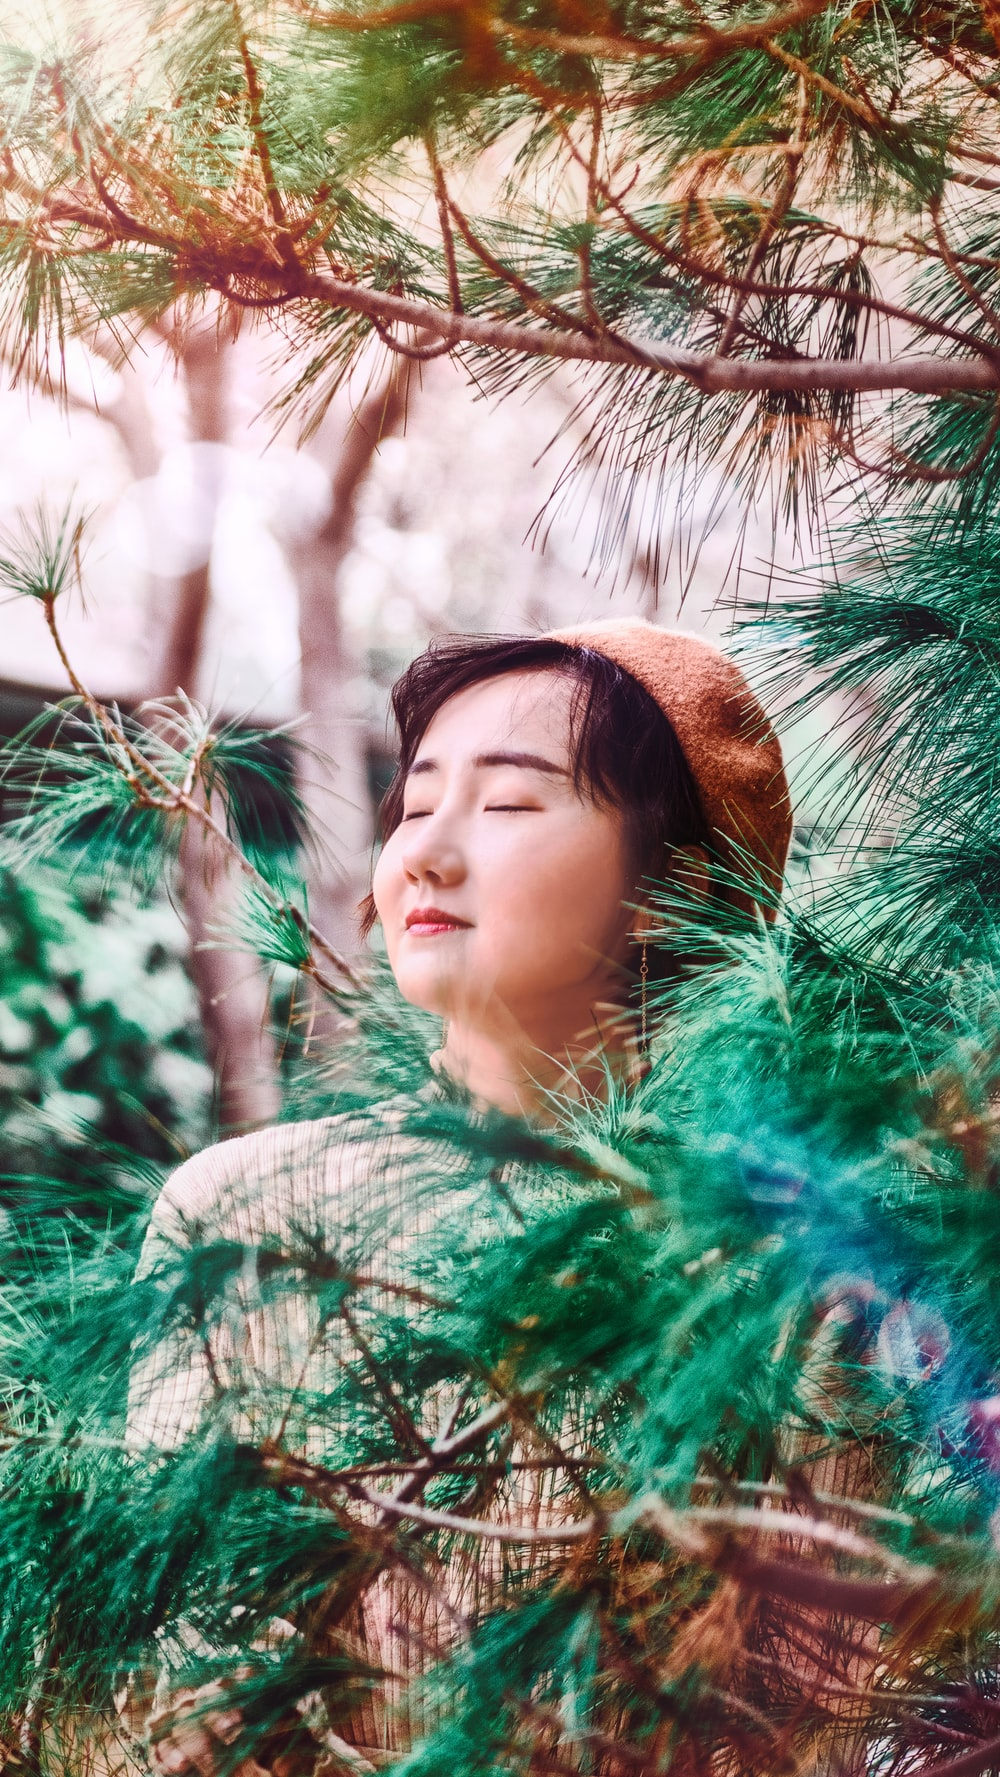 woman selective focus photography